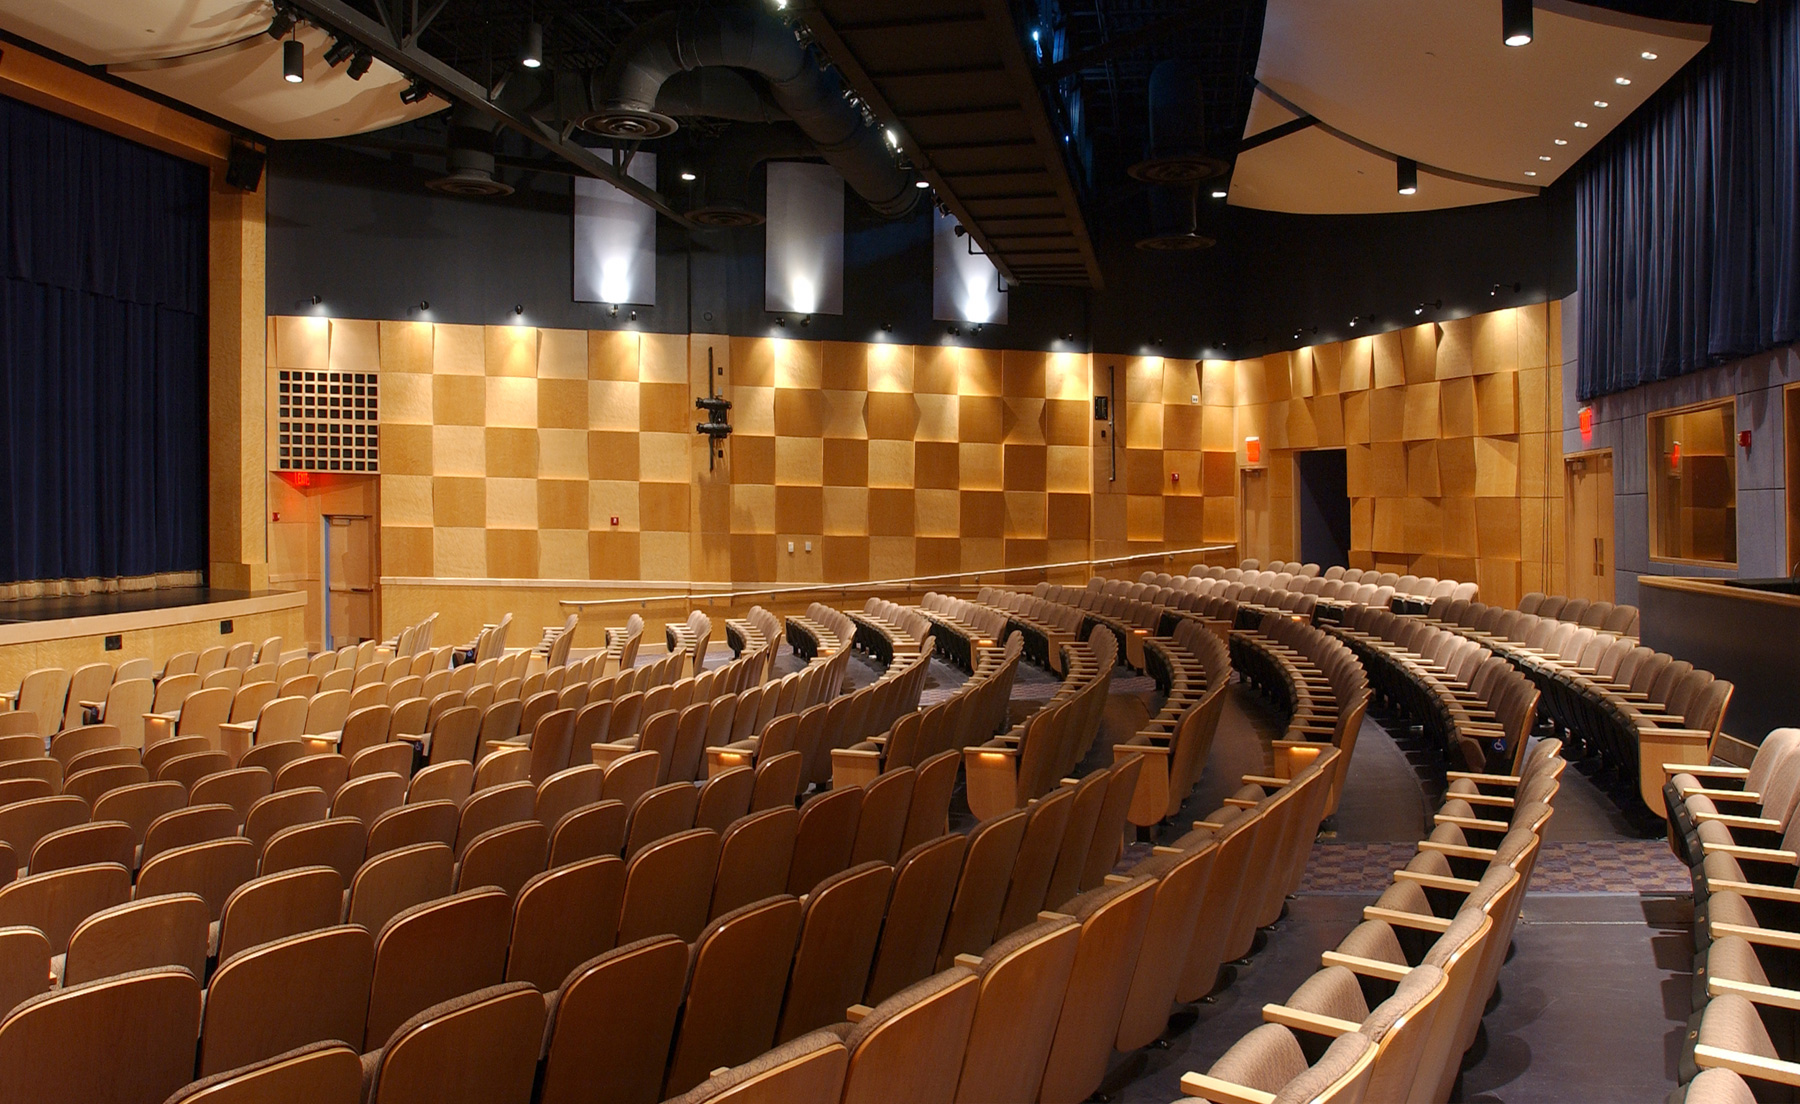 Sanply-maple-be-fla-mem-auditorium-2_8009900708_o